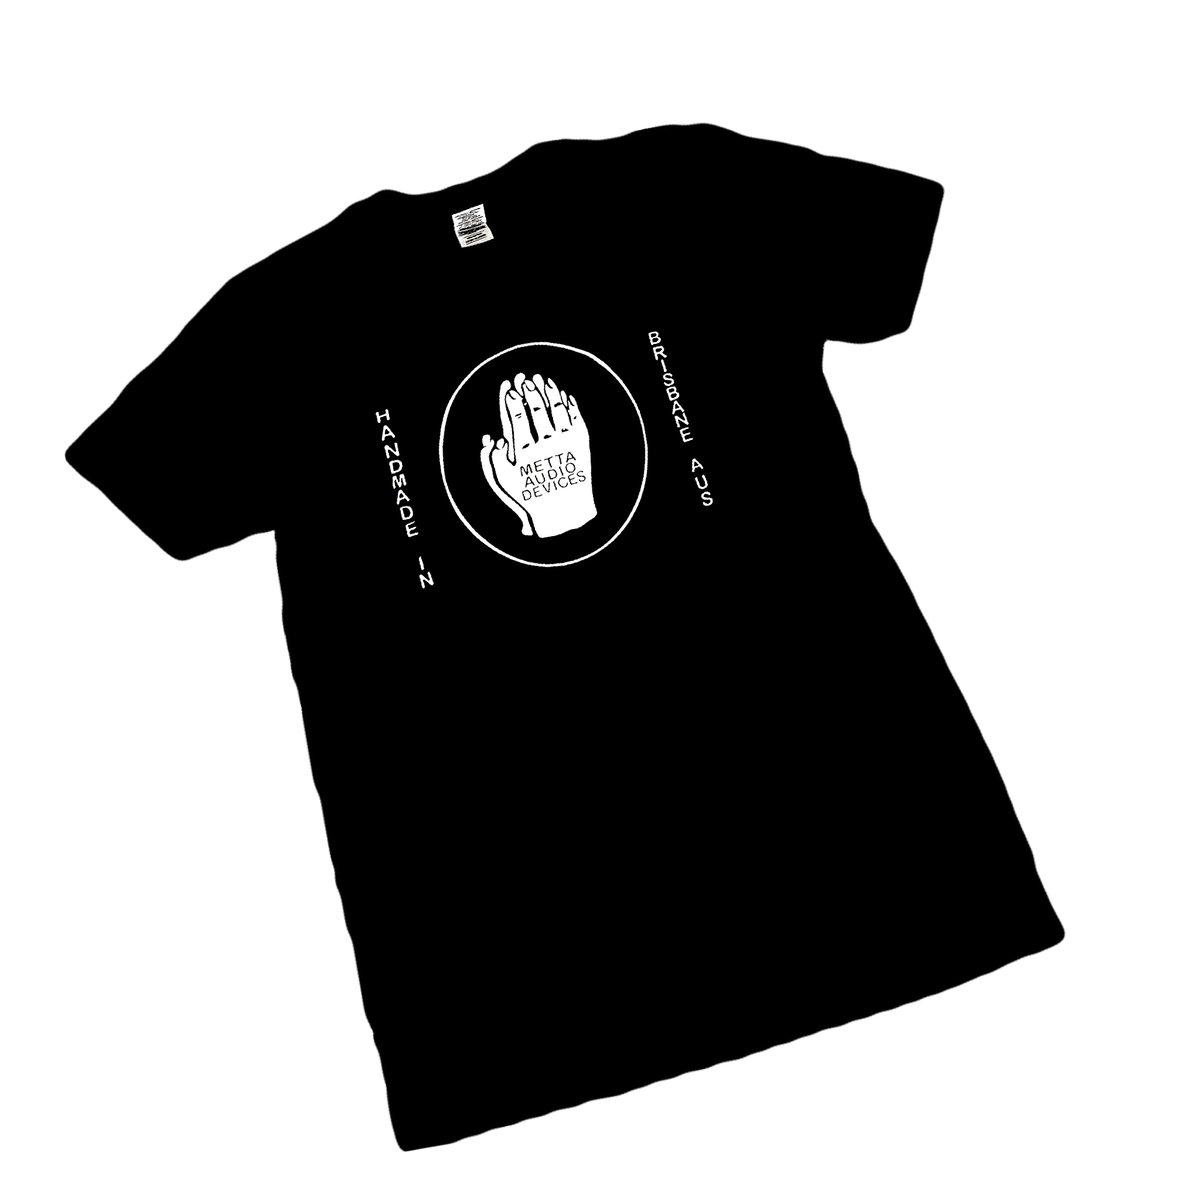 Image of Metta Audio Devices logo T-Shirt Black